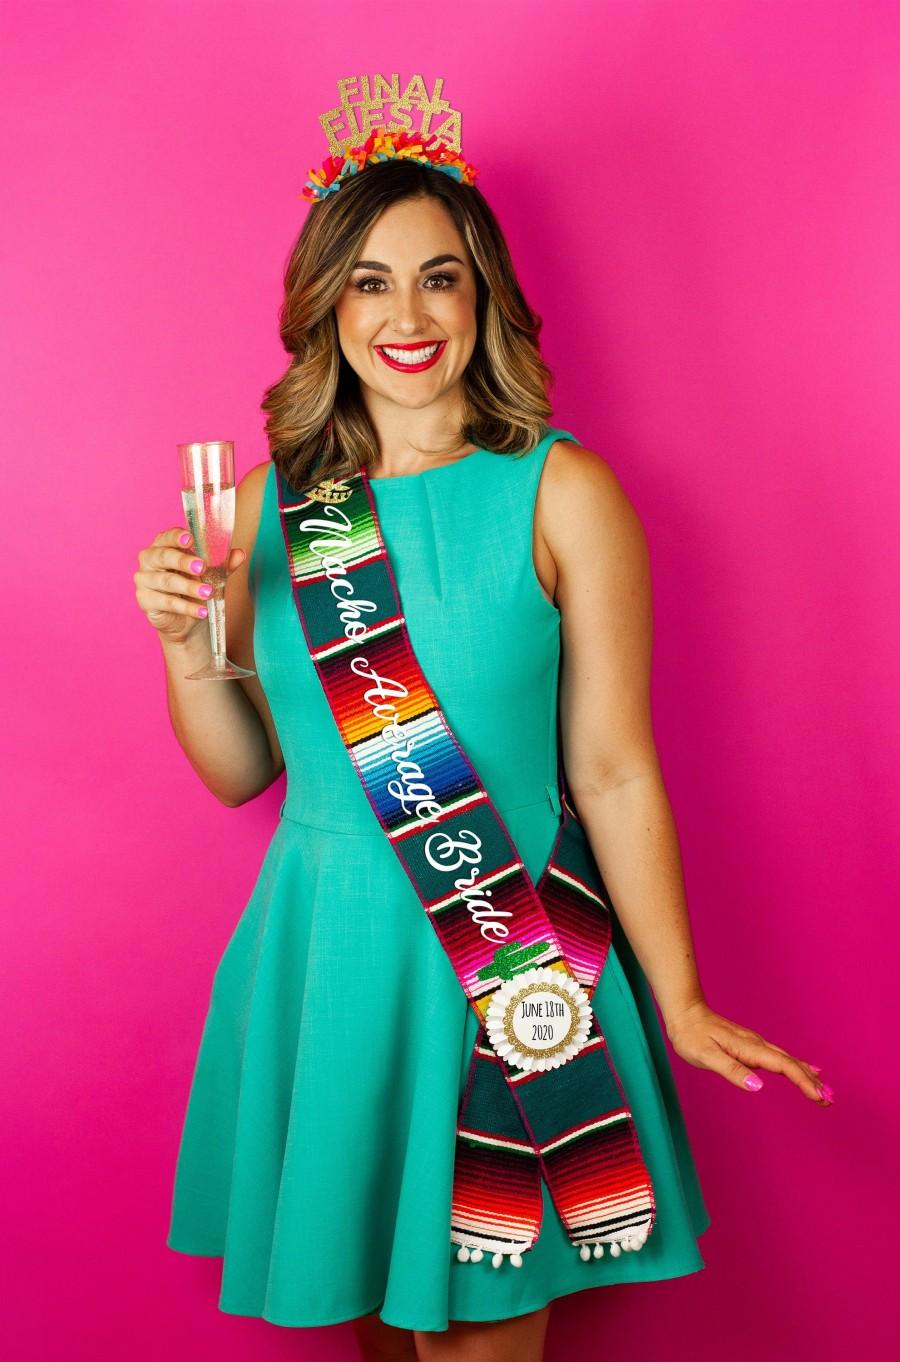 Mariage - Fiesta Bridal Shower Serape Sash - Bachelorette - Mexican Theme - Nacho Average Bride